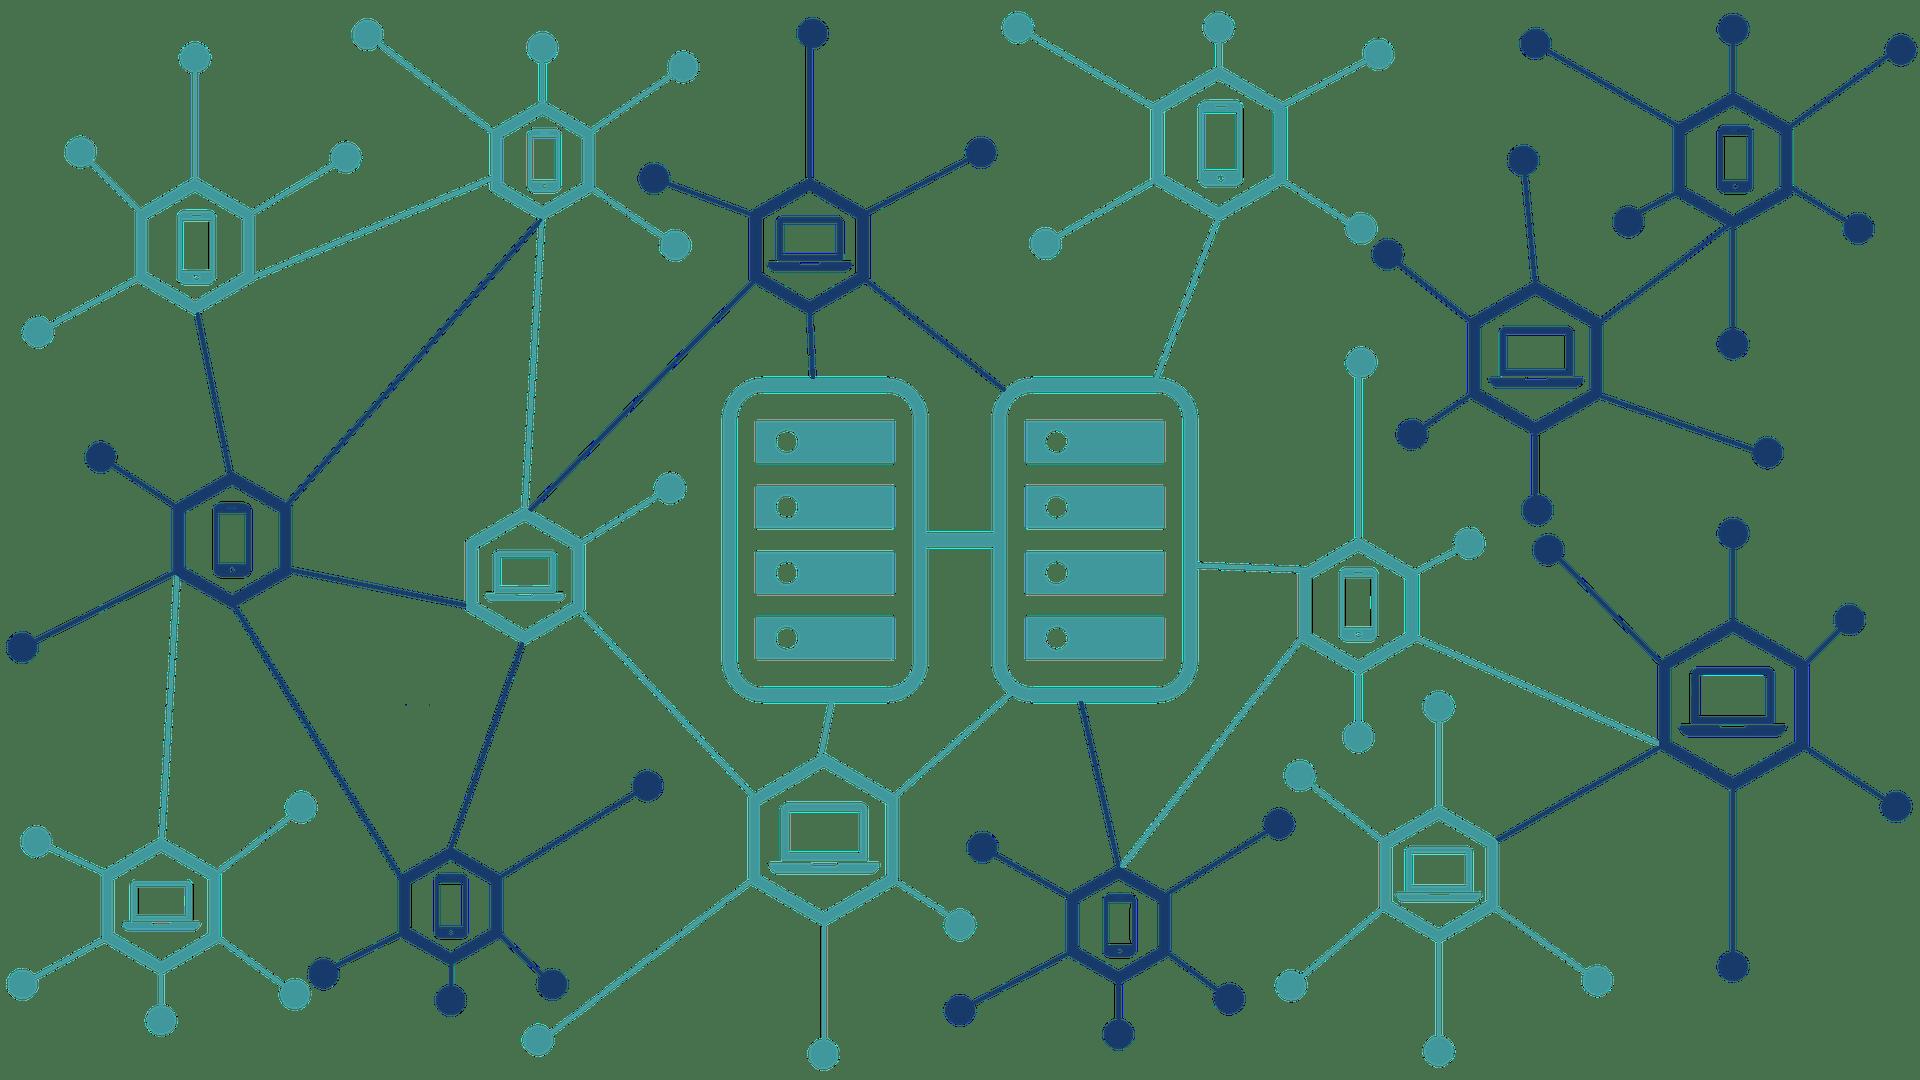 Internet-bitcoin-web-3.0-world-wide-web-blockchain-decentralisation-aspire-aspioneer.jpg.png